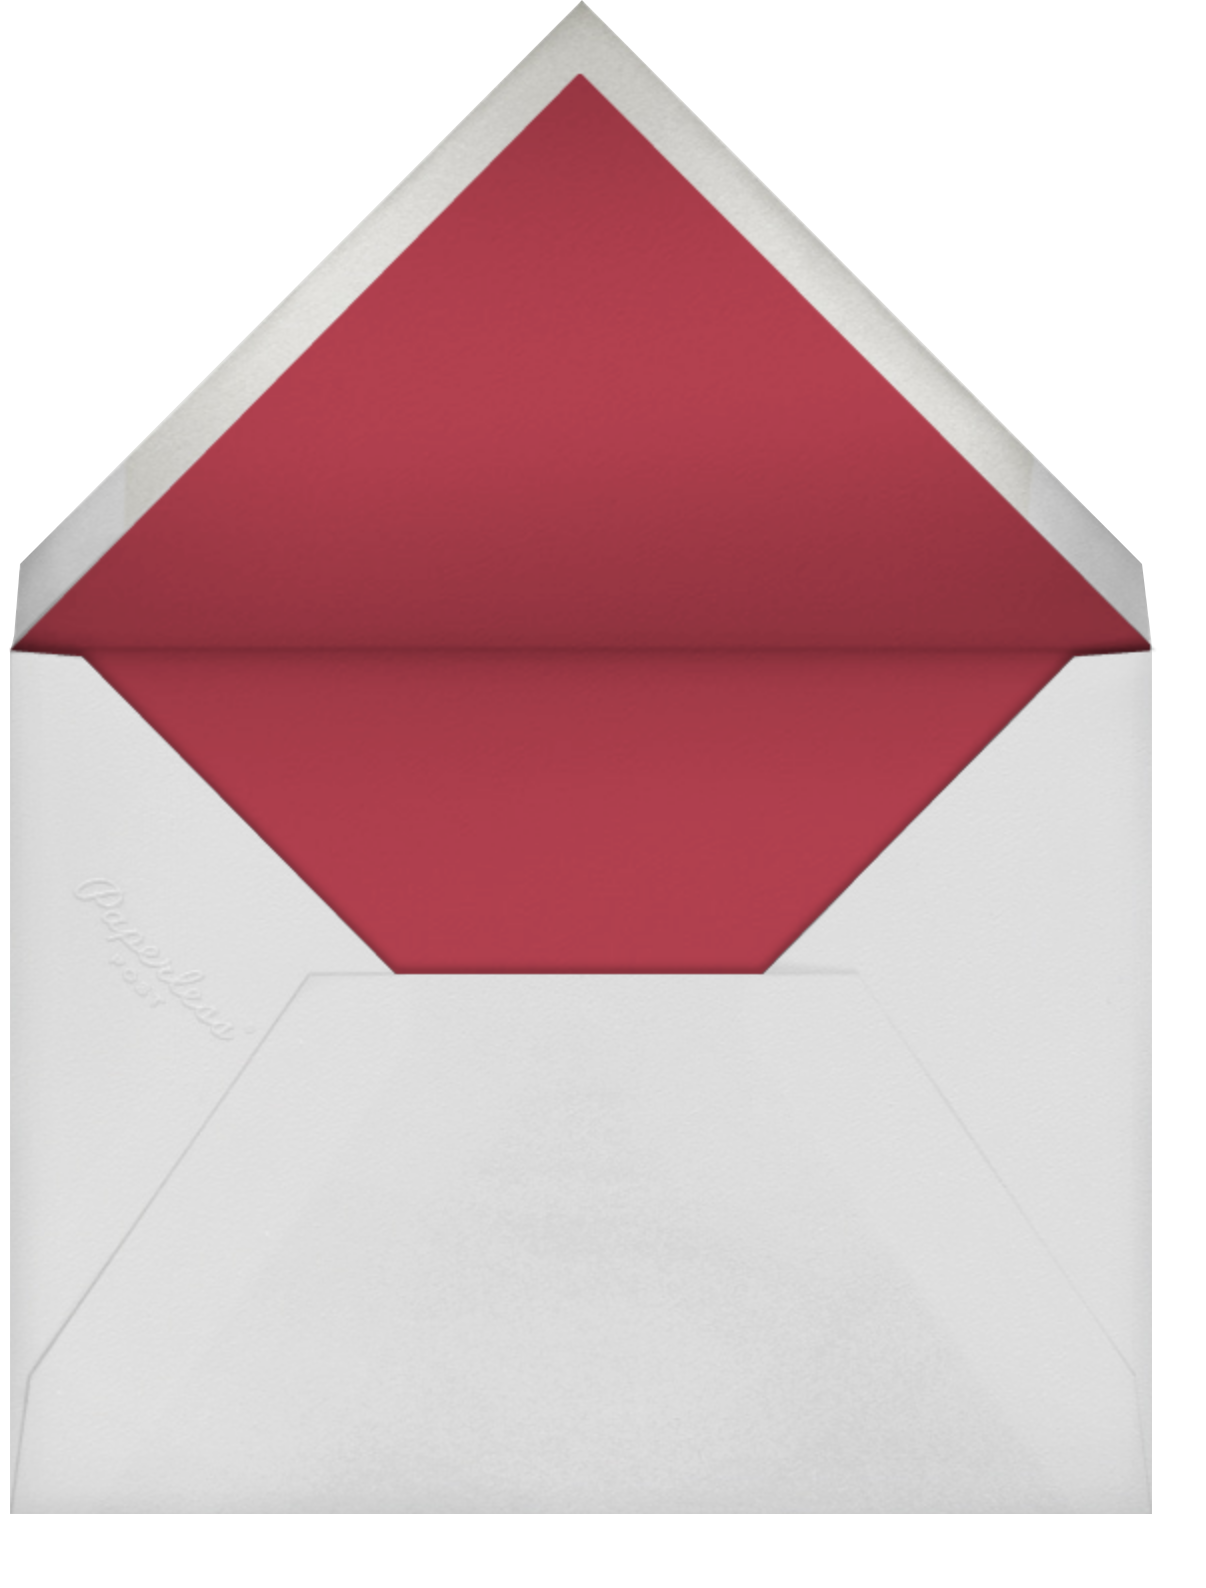 Falling Hearts - Tea Rose - kate spade new york - Valentine's Day - envelope back